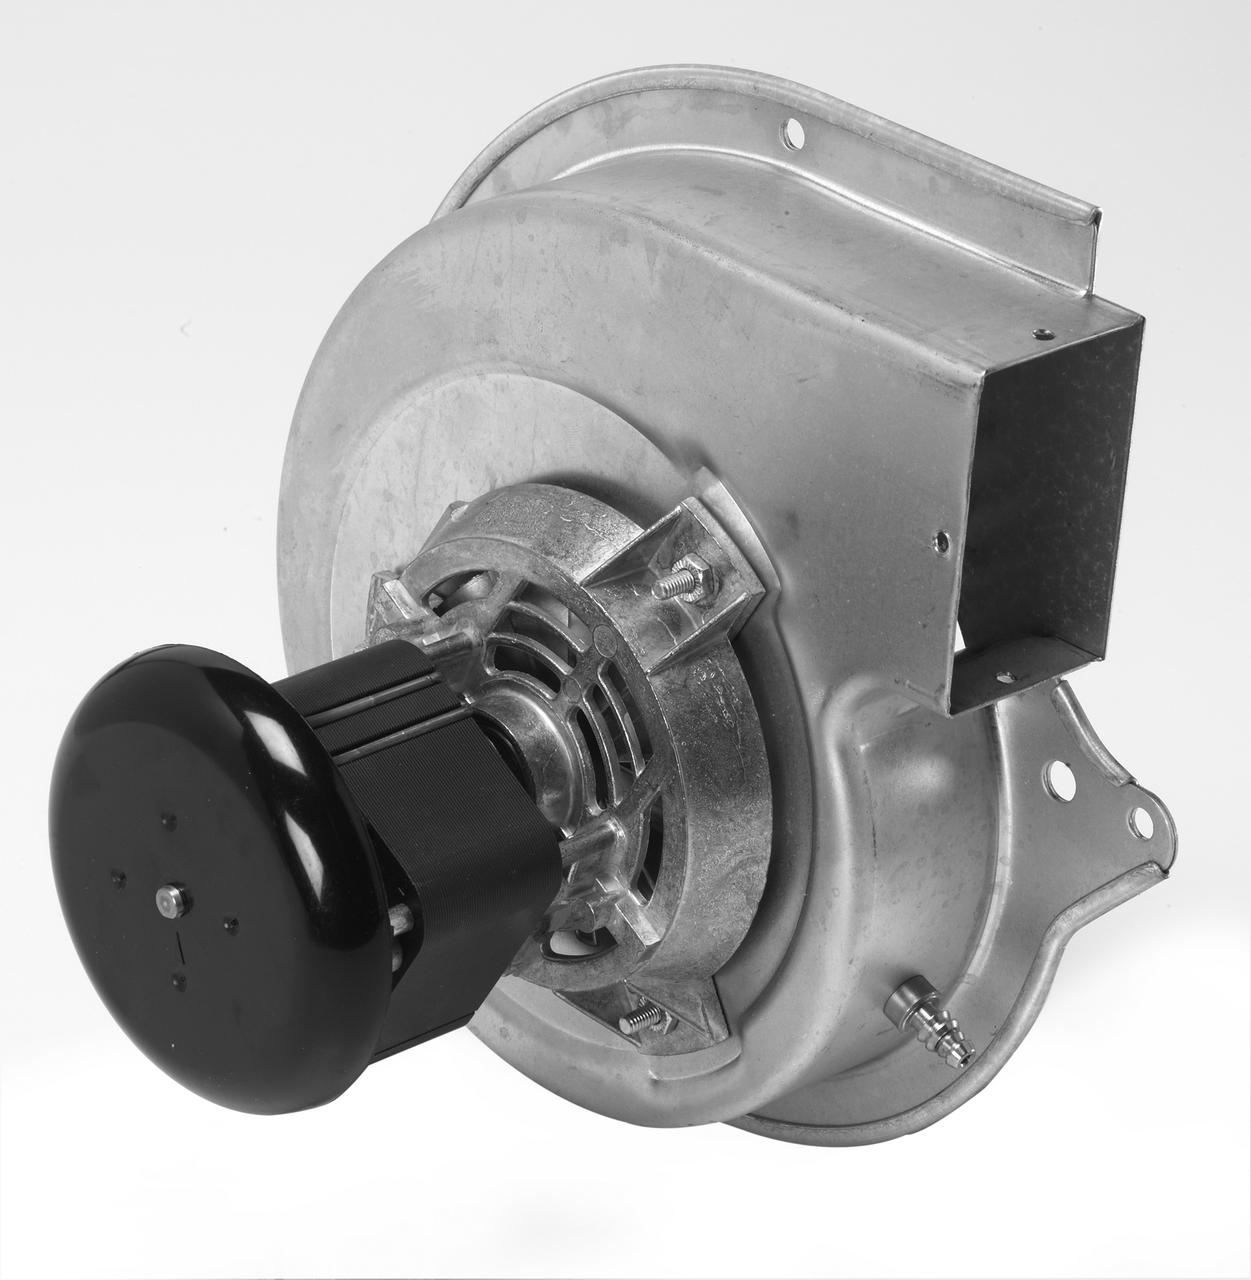 Fasco Furnace Draft Inducer Motor A184 for Goodman 7058-0229 B4059001 B40590-01